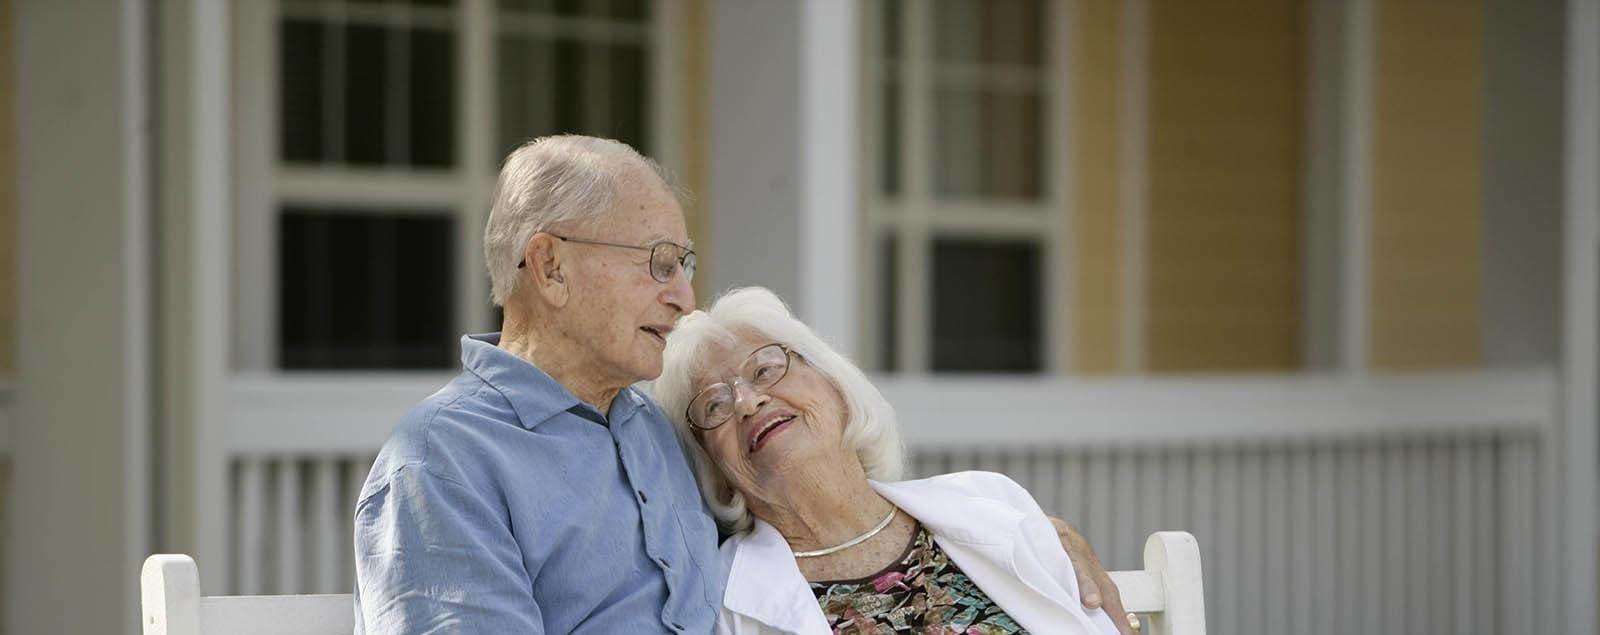 Senior Living mailing list available in Jacksonville